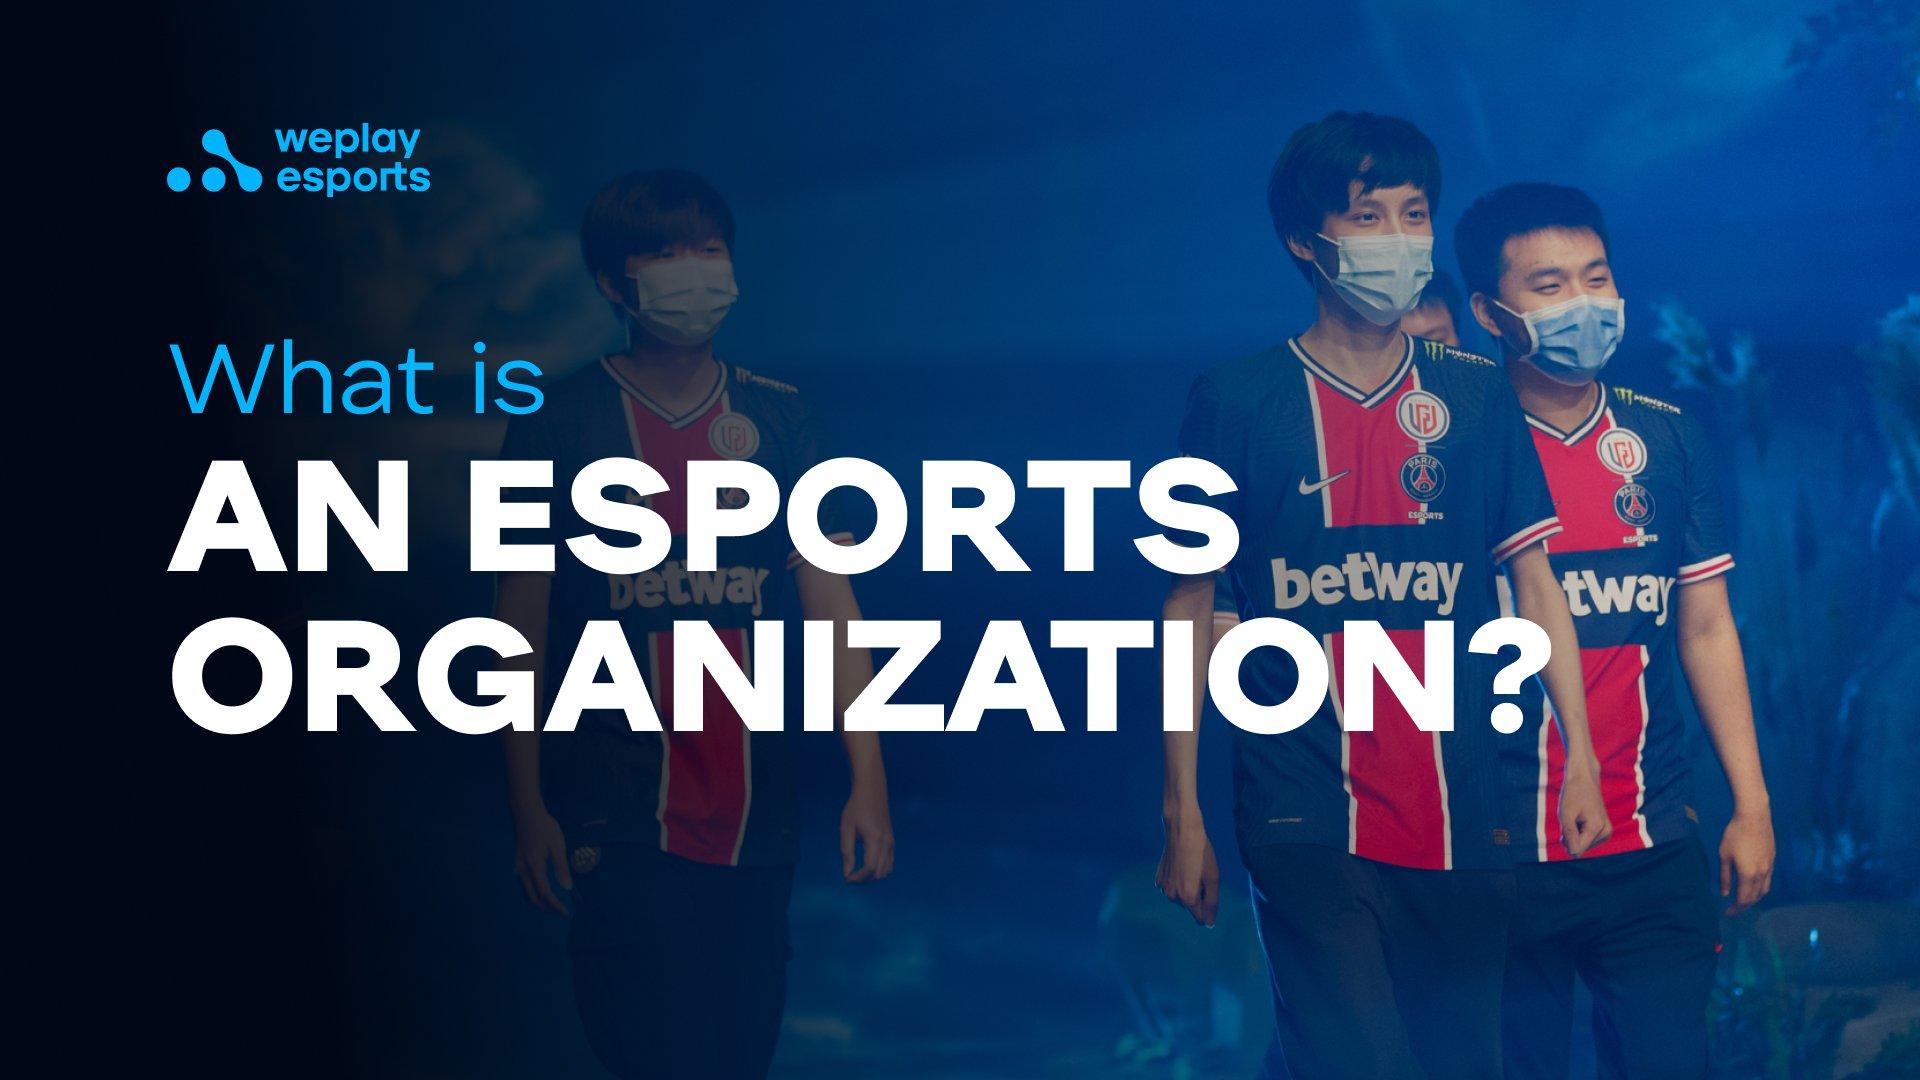 What is an esports organization?